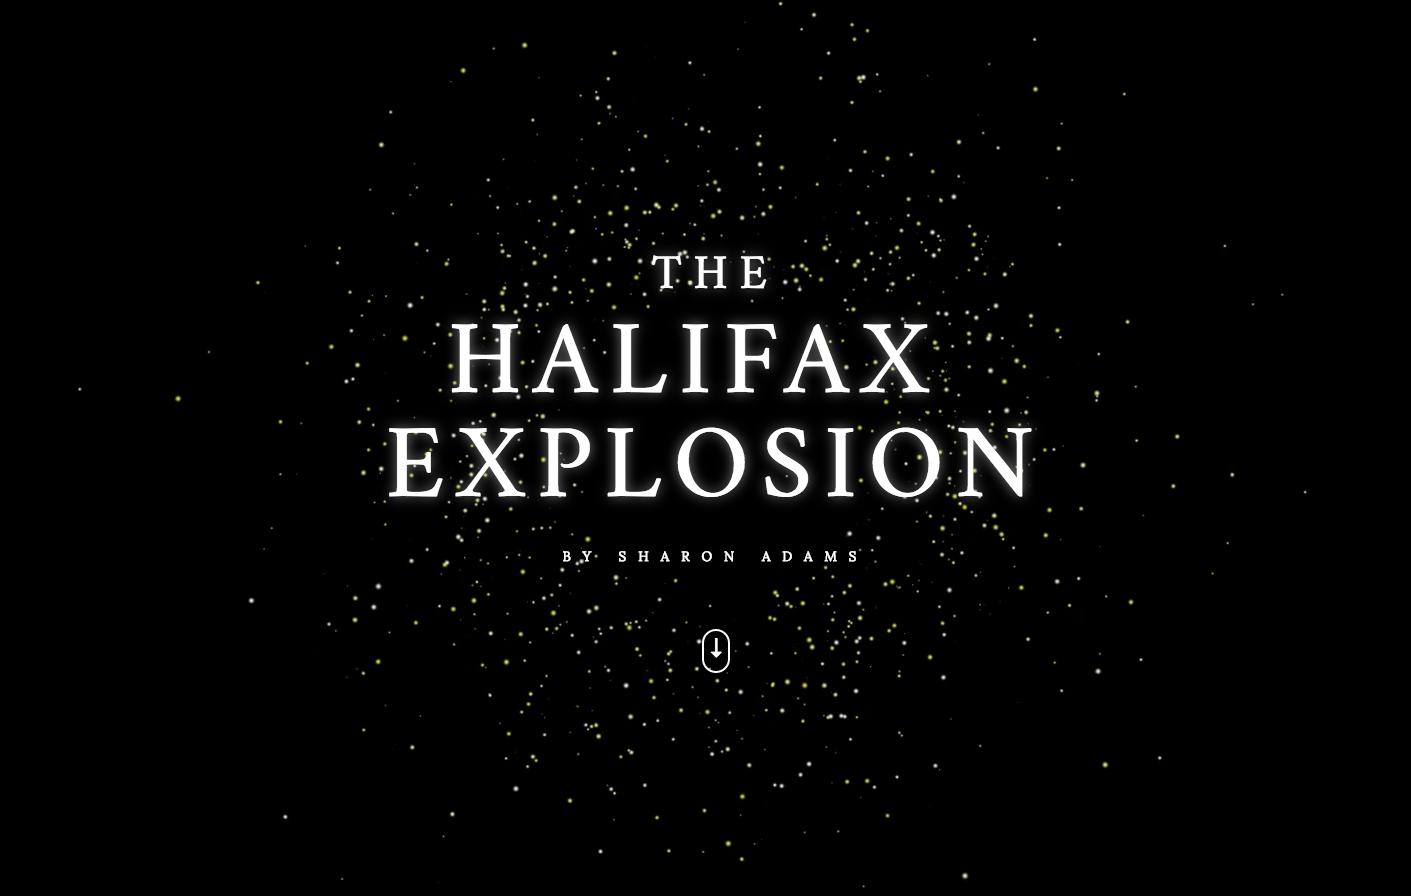 Halifax explosion thumbnail